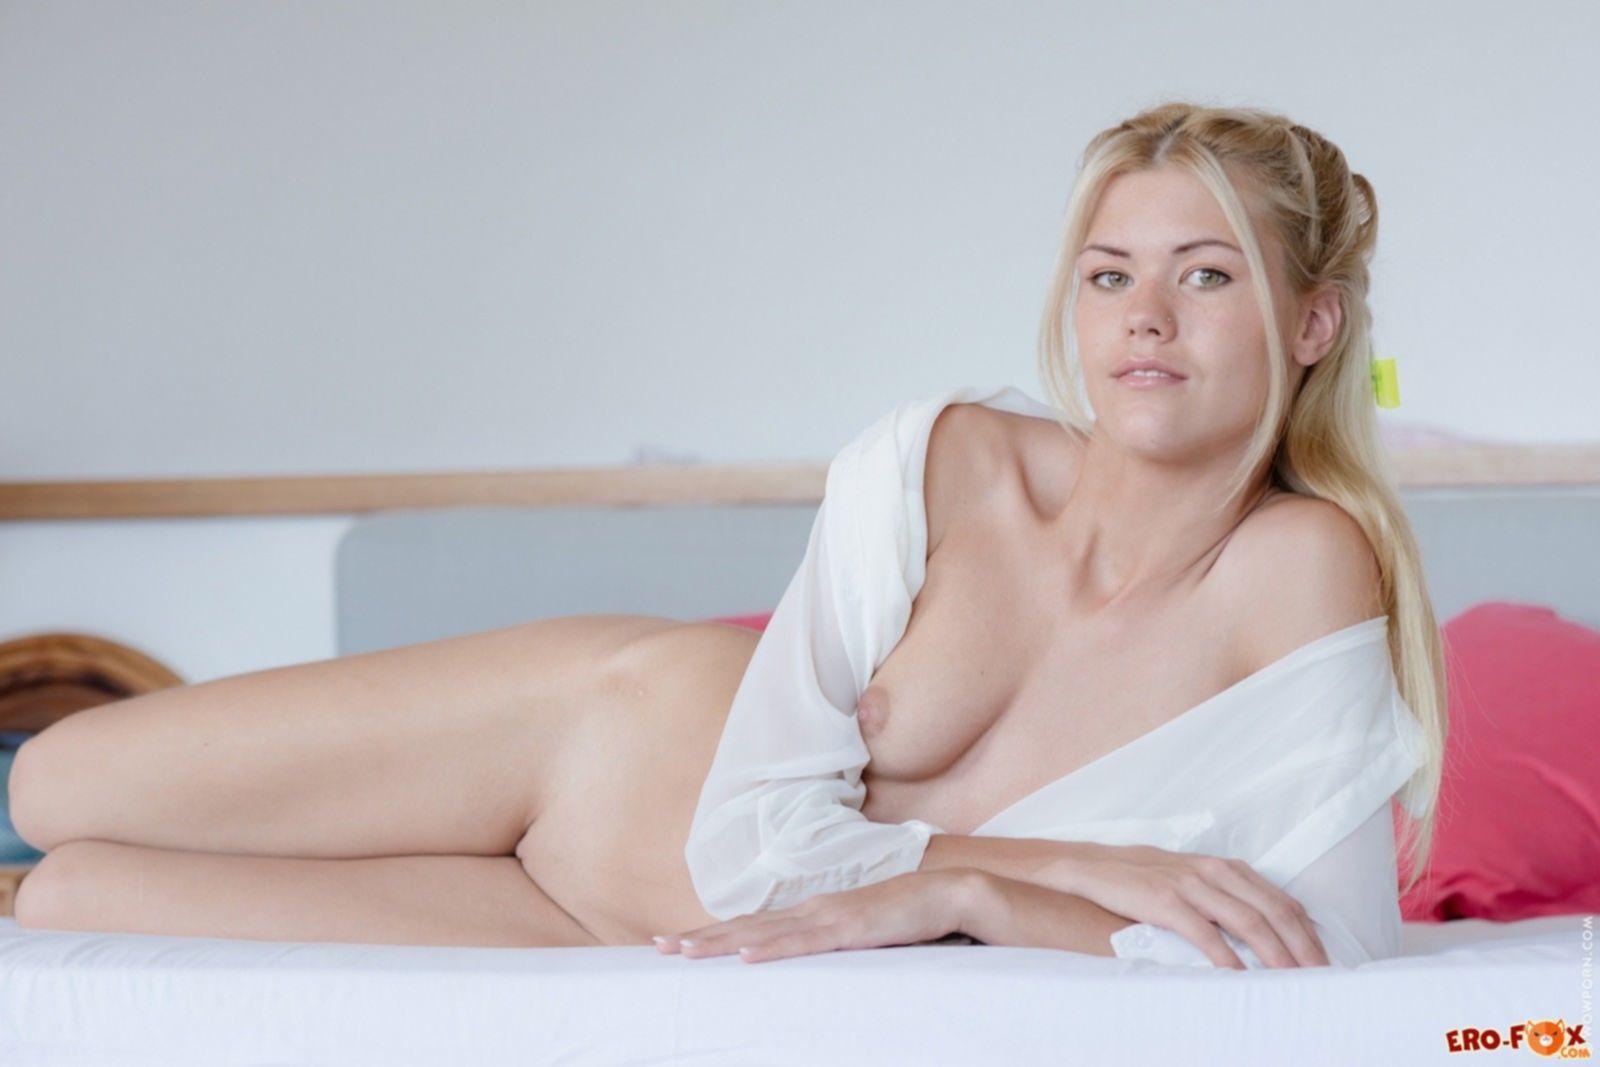 Девушка в рубашке без нижнего белья на кровати - фото